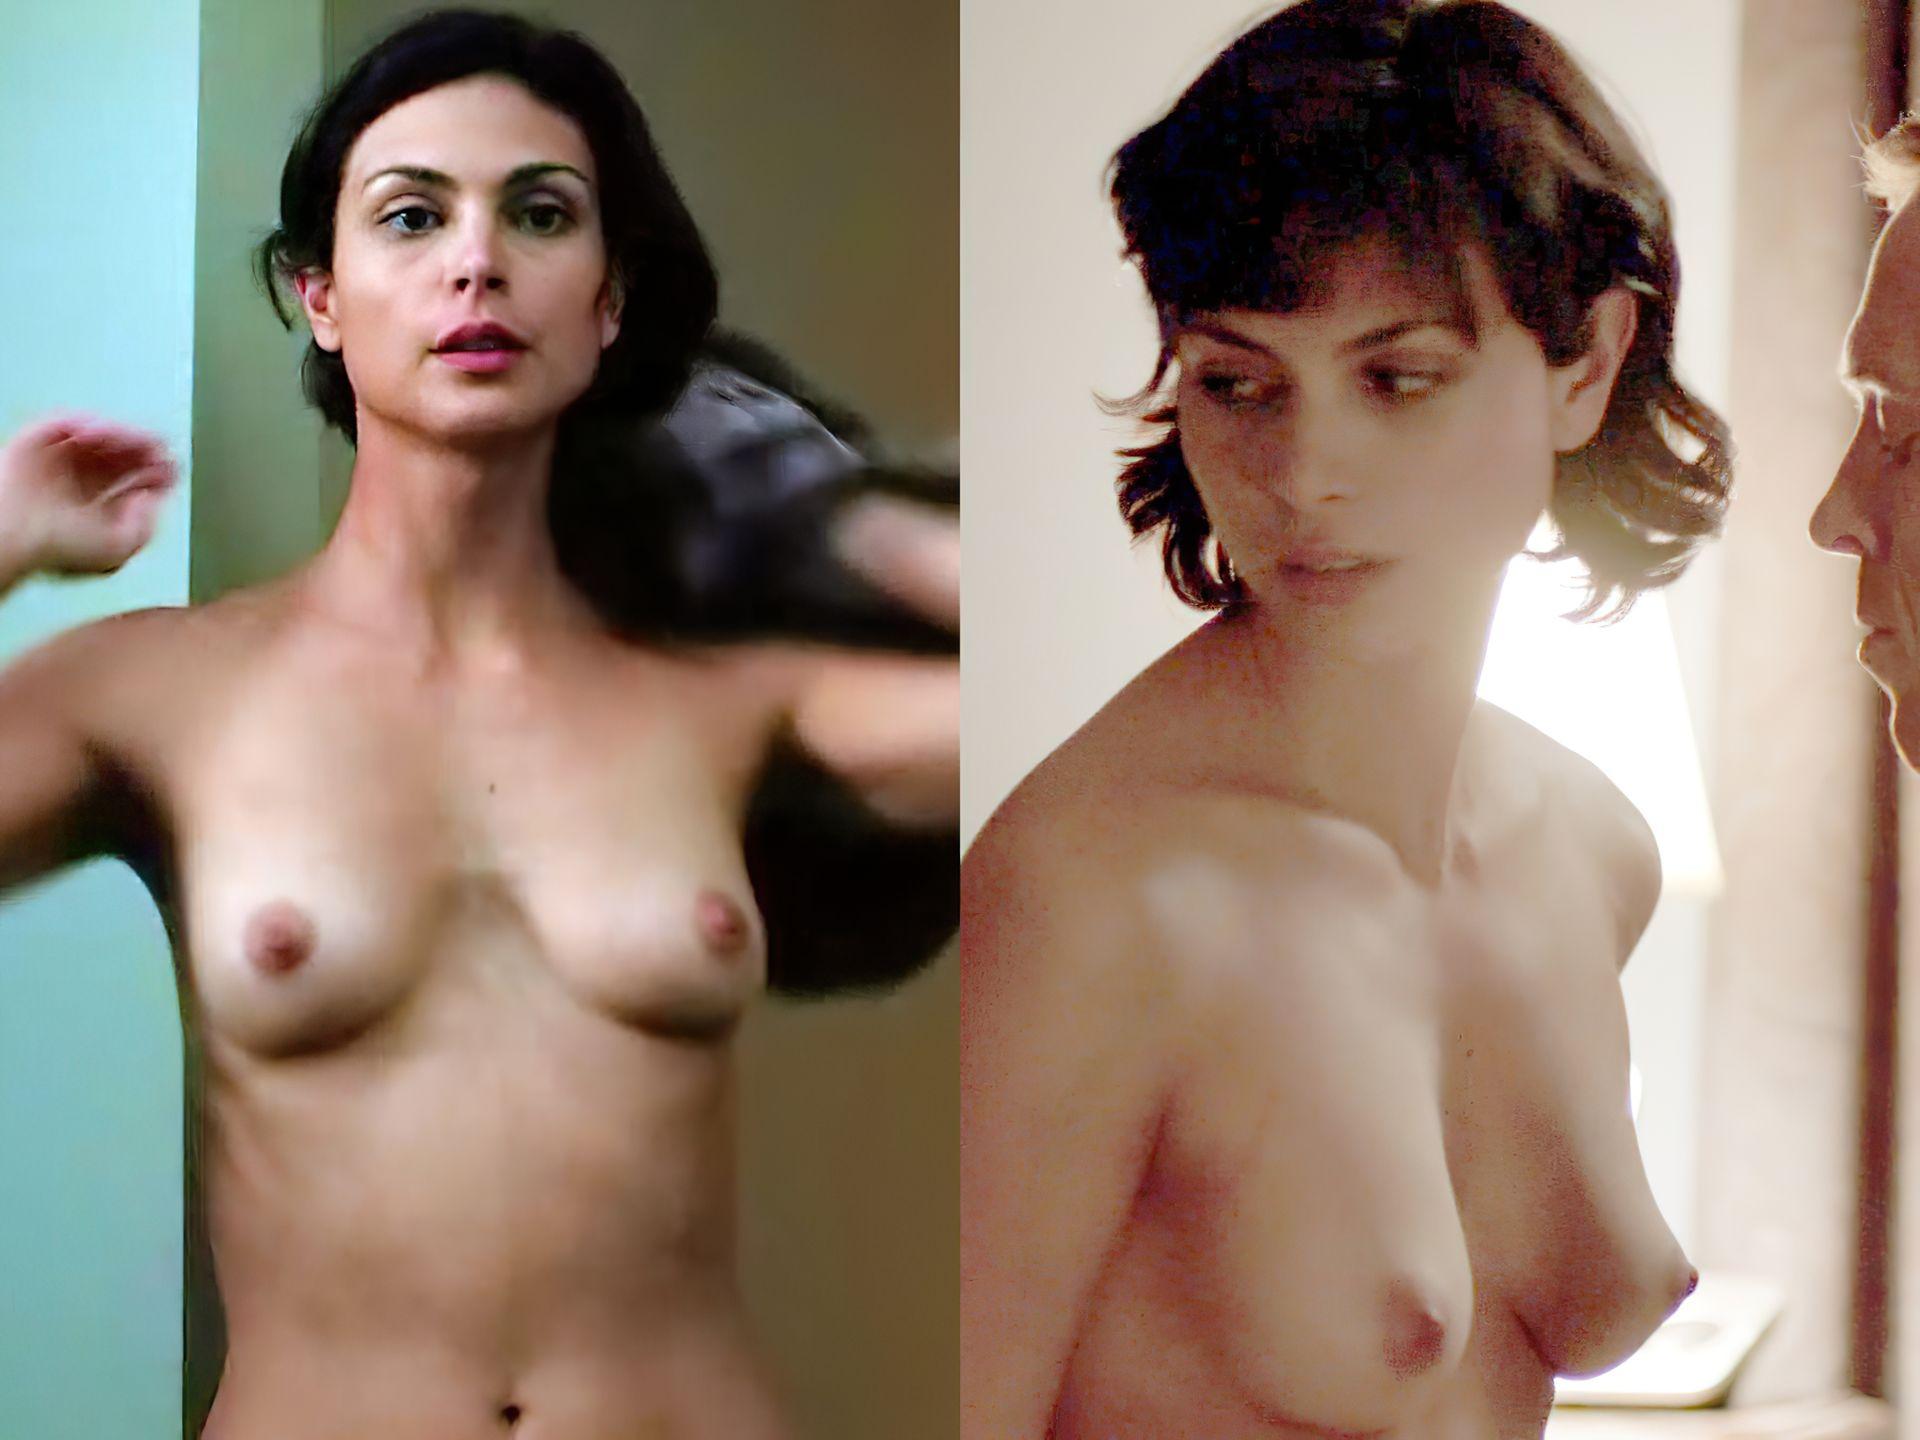 Vanessa hudgens nude playboy magazine celebrity cover naked photo shoot